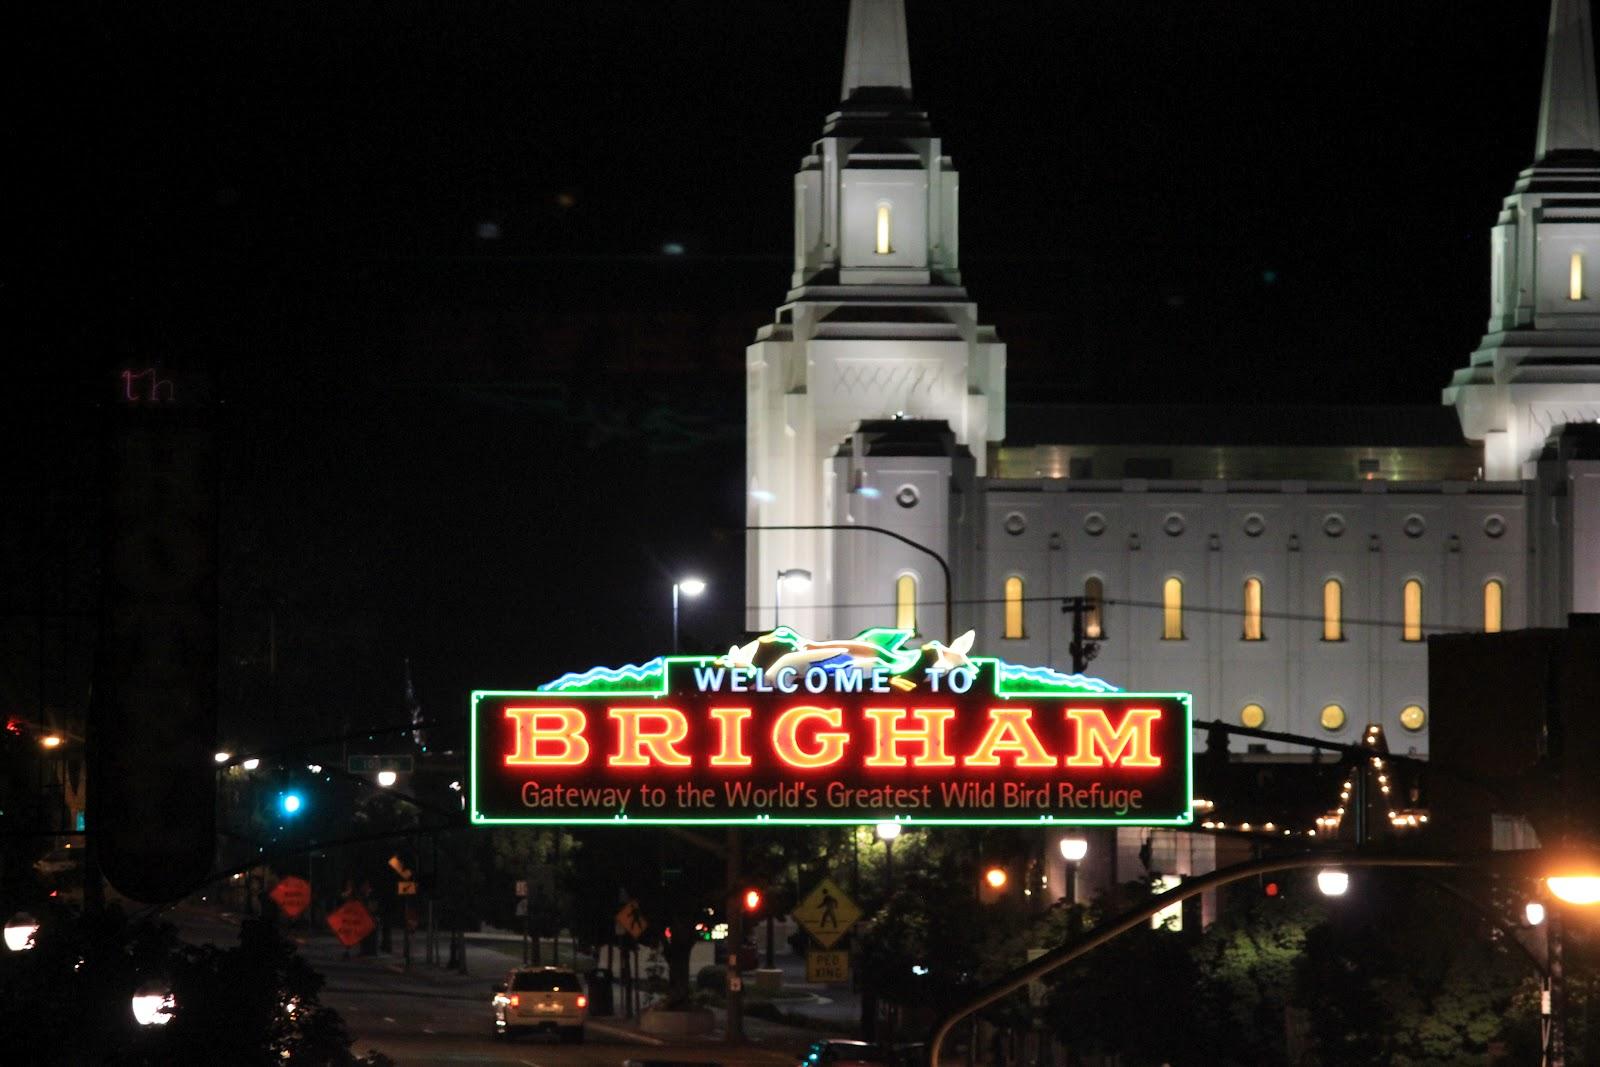 brigham city hindu single men Brigham city utah temple,  young men general presidency says february 17, 2018 post navigation oquirrh mountain utah temple payson utah temple.